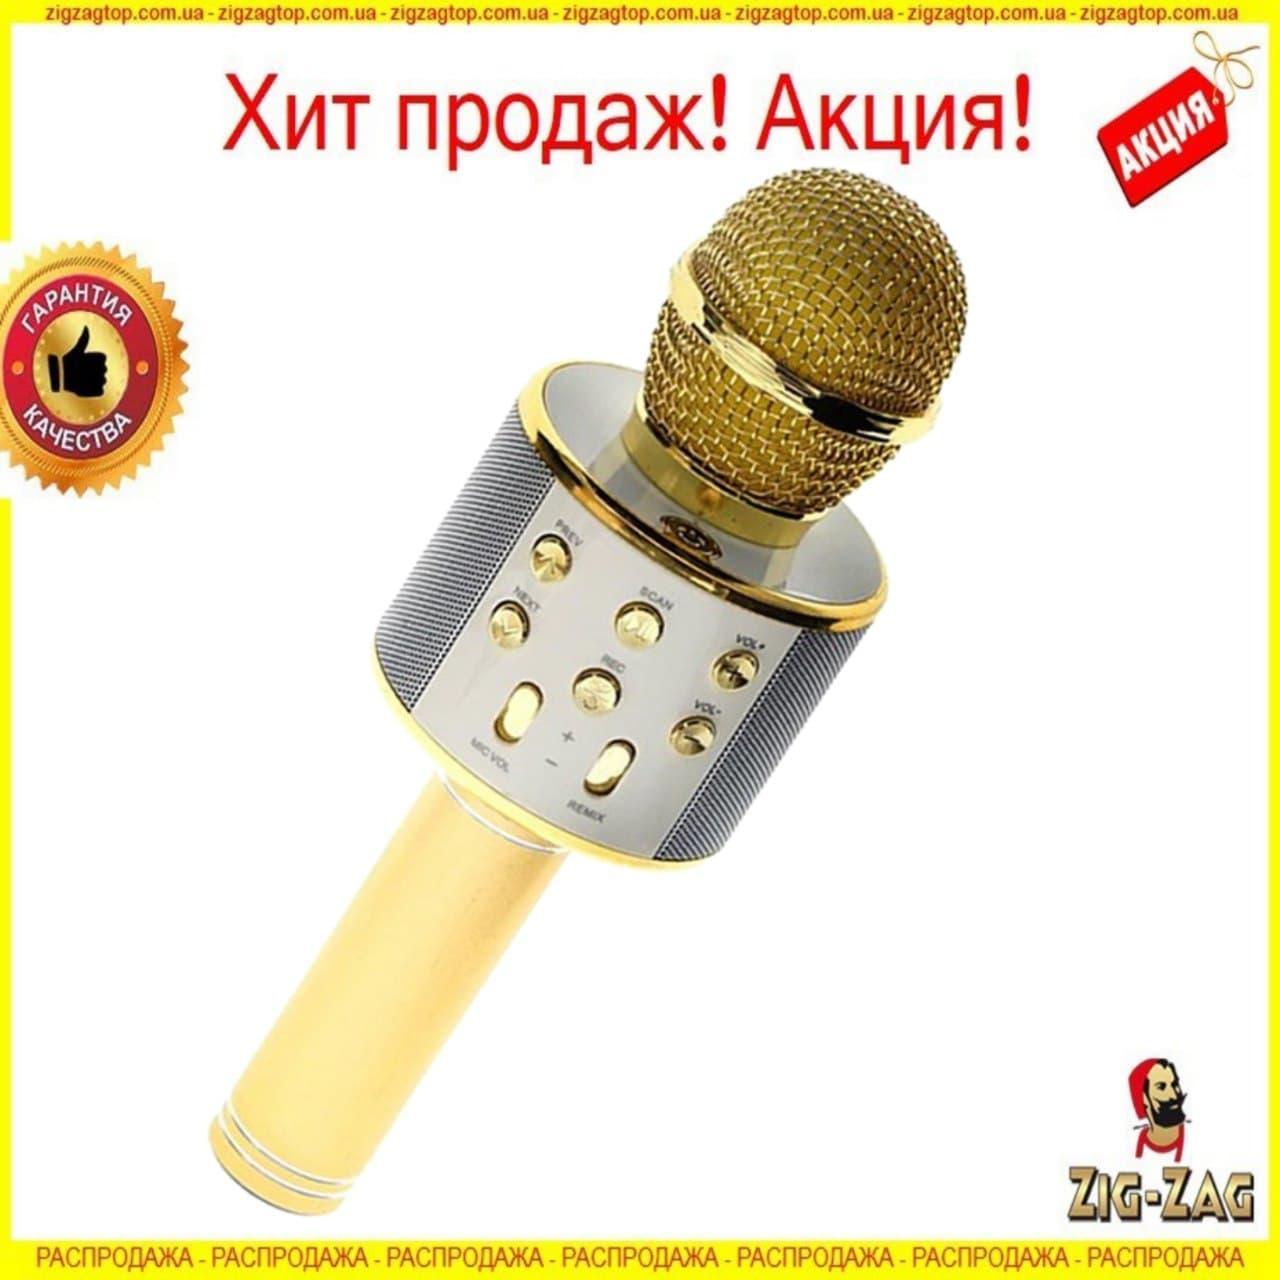 Караоке микрофон Беспроводной микрофон Wster WS-858 Bluetooth 4.0 Селфи МРЗ FM Aудио-вход аккумулятор 2600 mAh